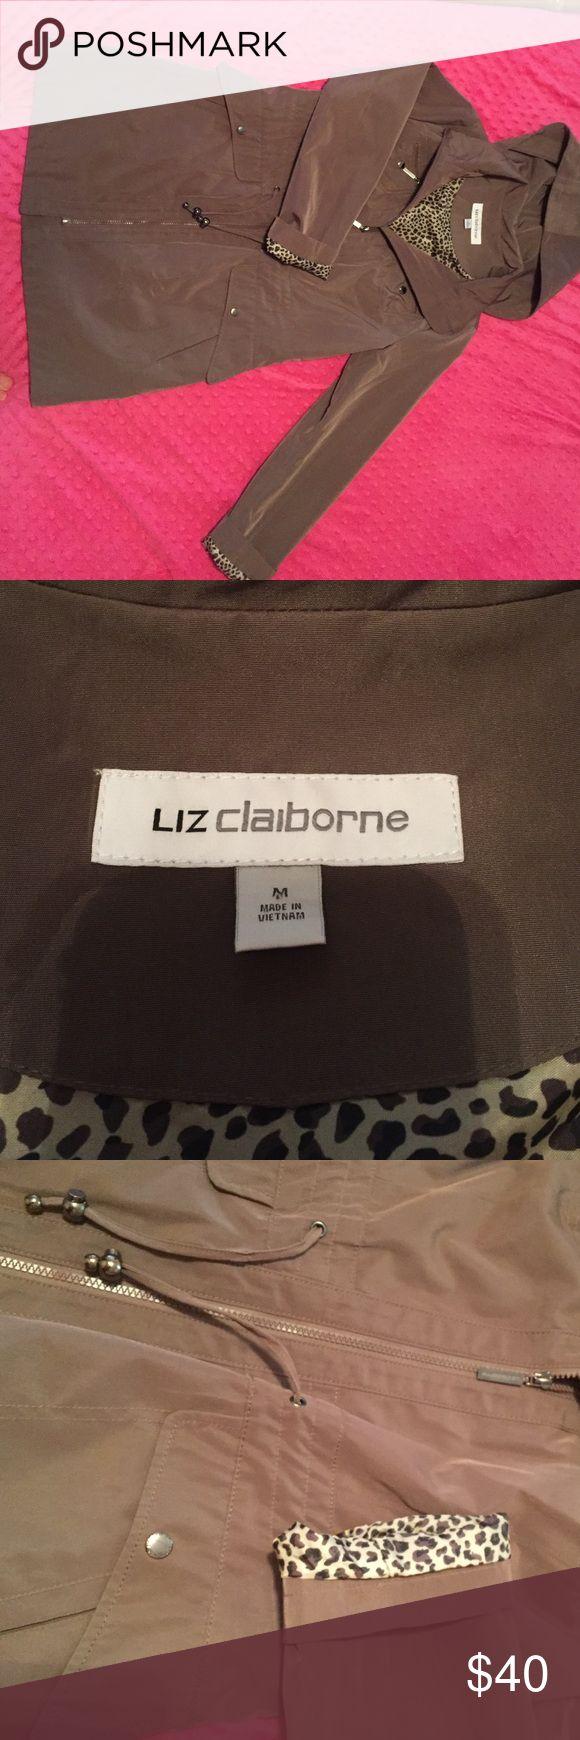 Liz Claiborne knee length coat Liz Claiborne brown knee length coat size medium. Never worn. New without tags. Excellent condition so buy now! Liz Claiborne Jackets & Coats Trench Coats